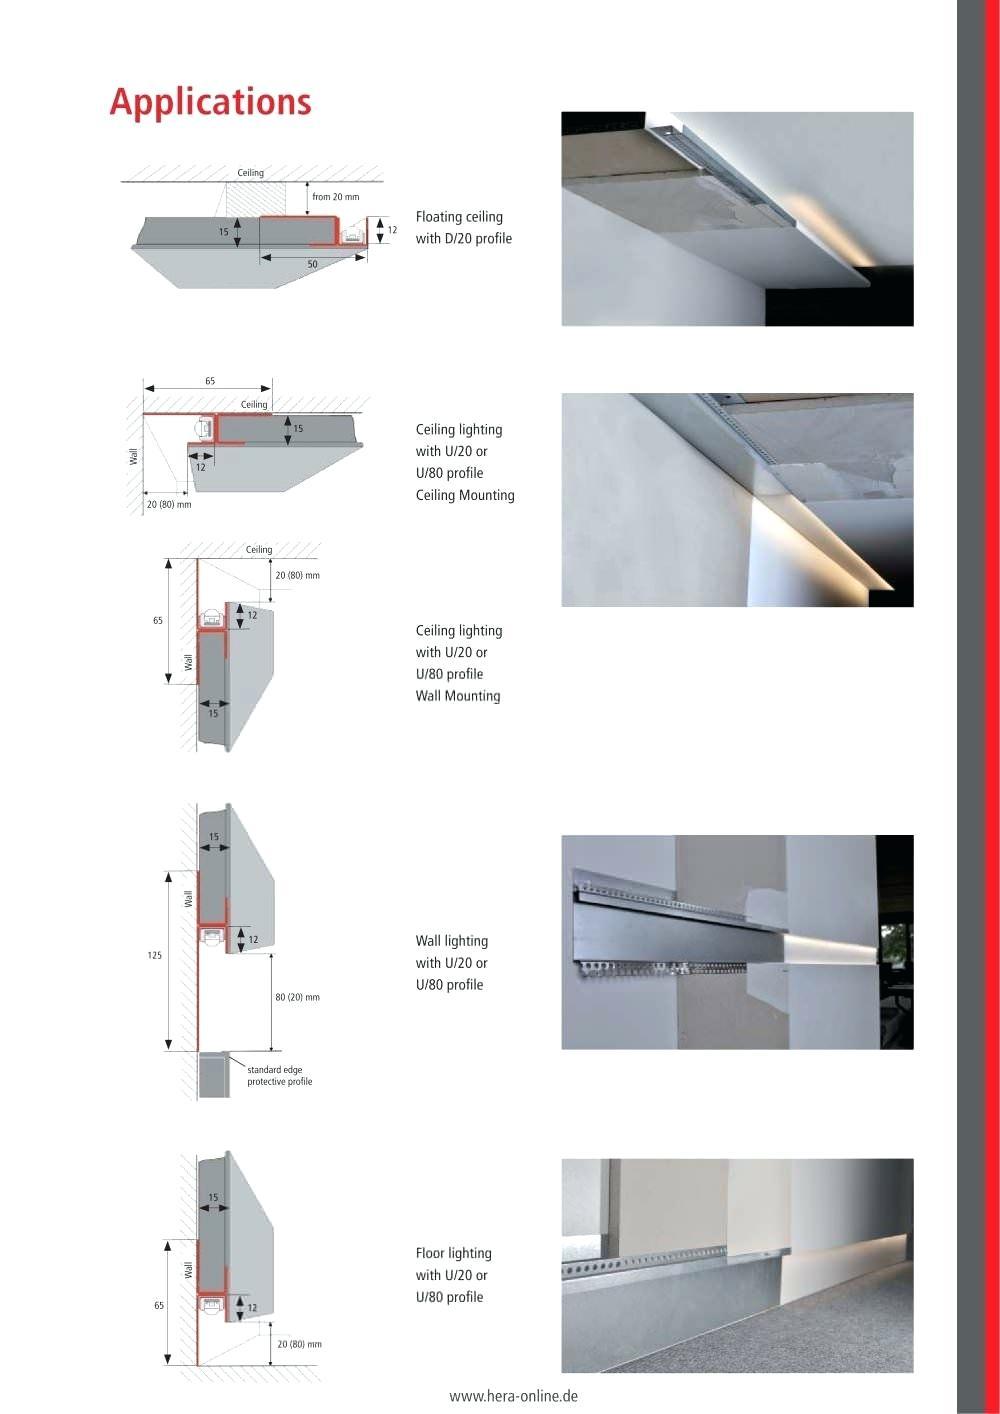 Trockenbauwand Dubel Construction Trockenbau Fischer Schwerlast Seitenbeleuchtung Streifenbeleuchtung Blitz Design